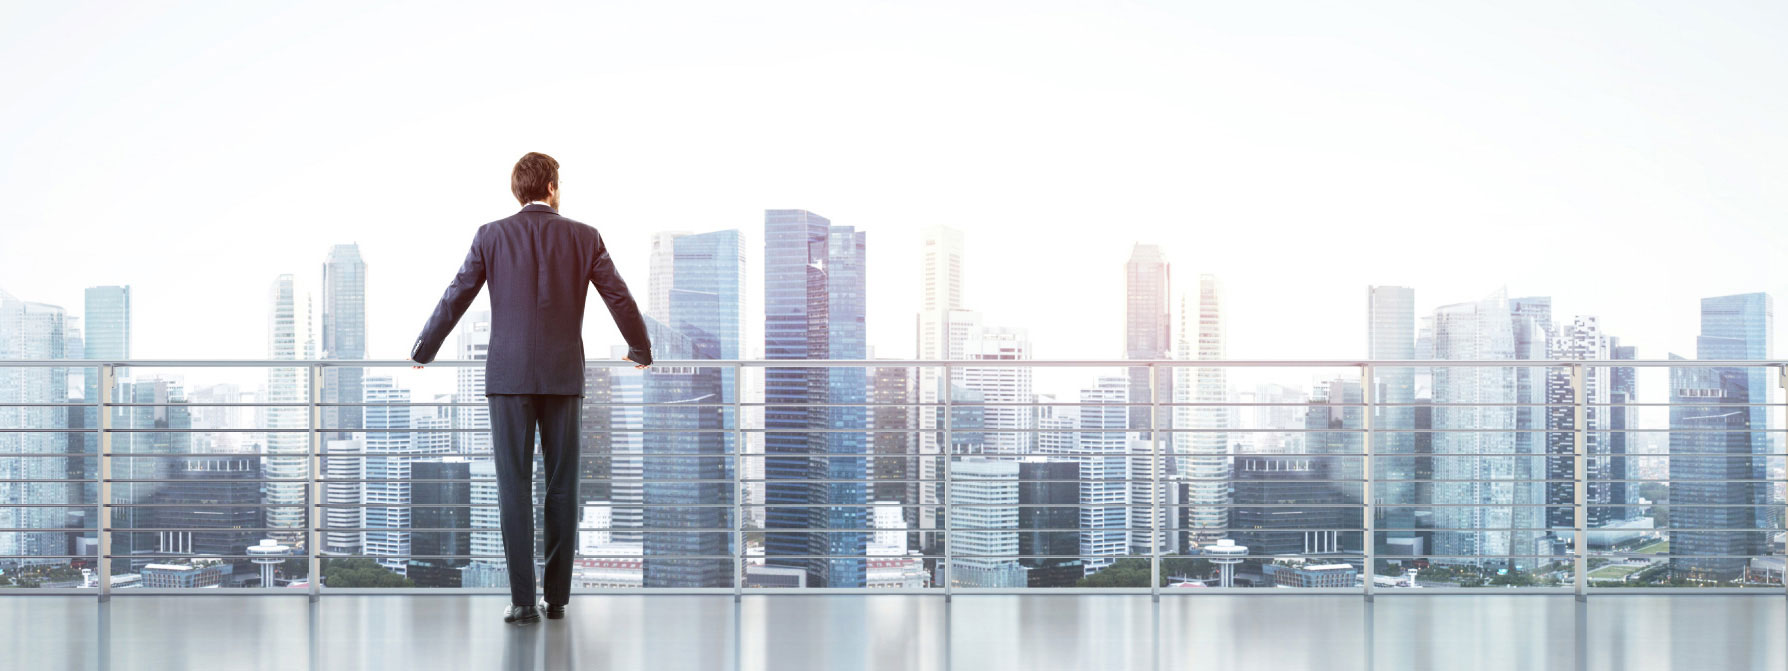 Key Factors to Consider Before Choosing a Realtor